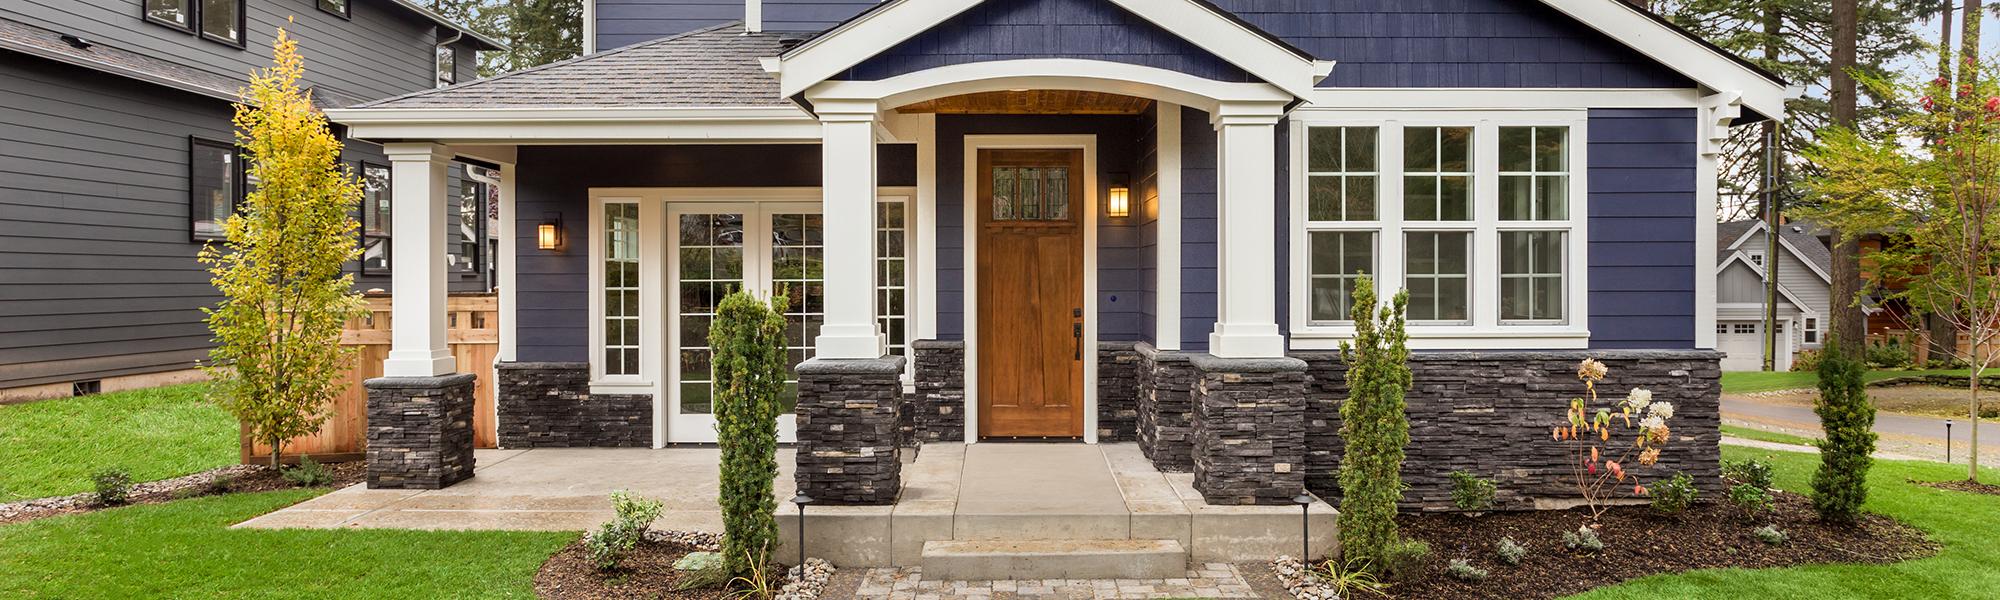 House exterior photo